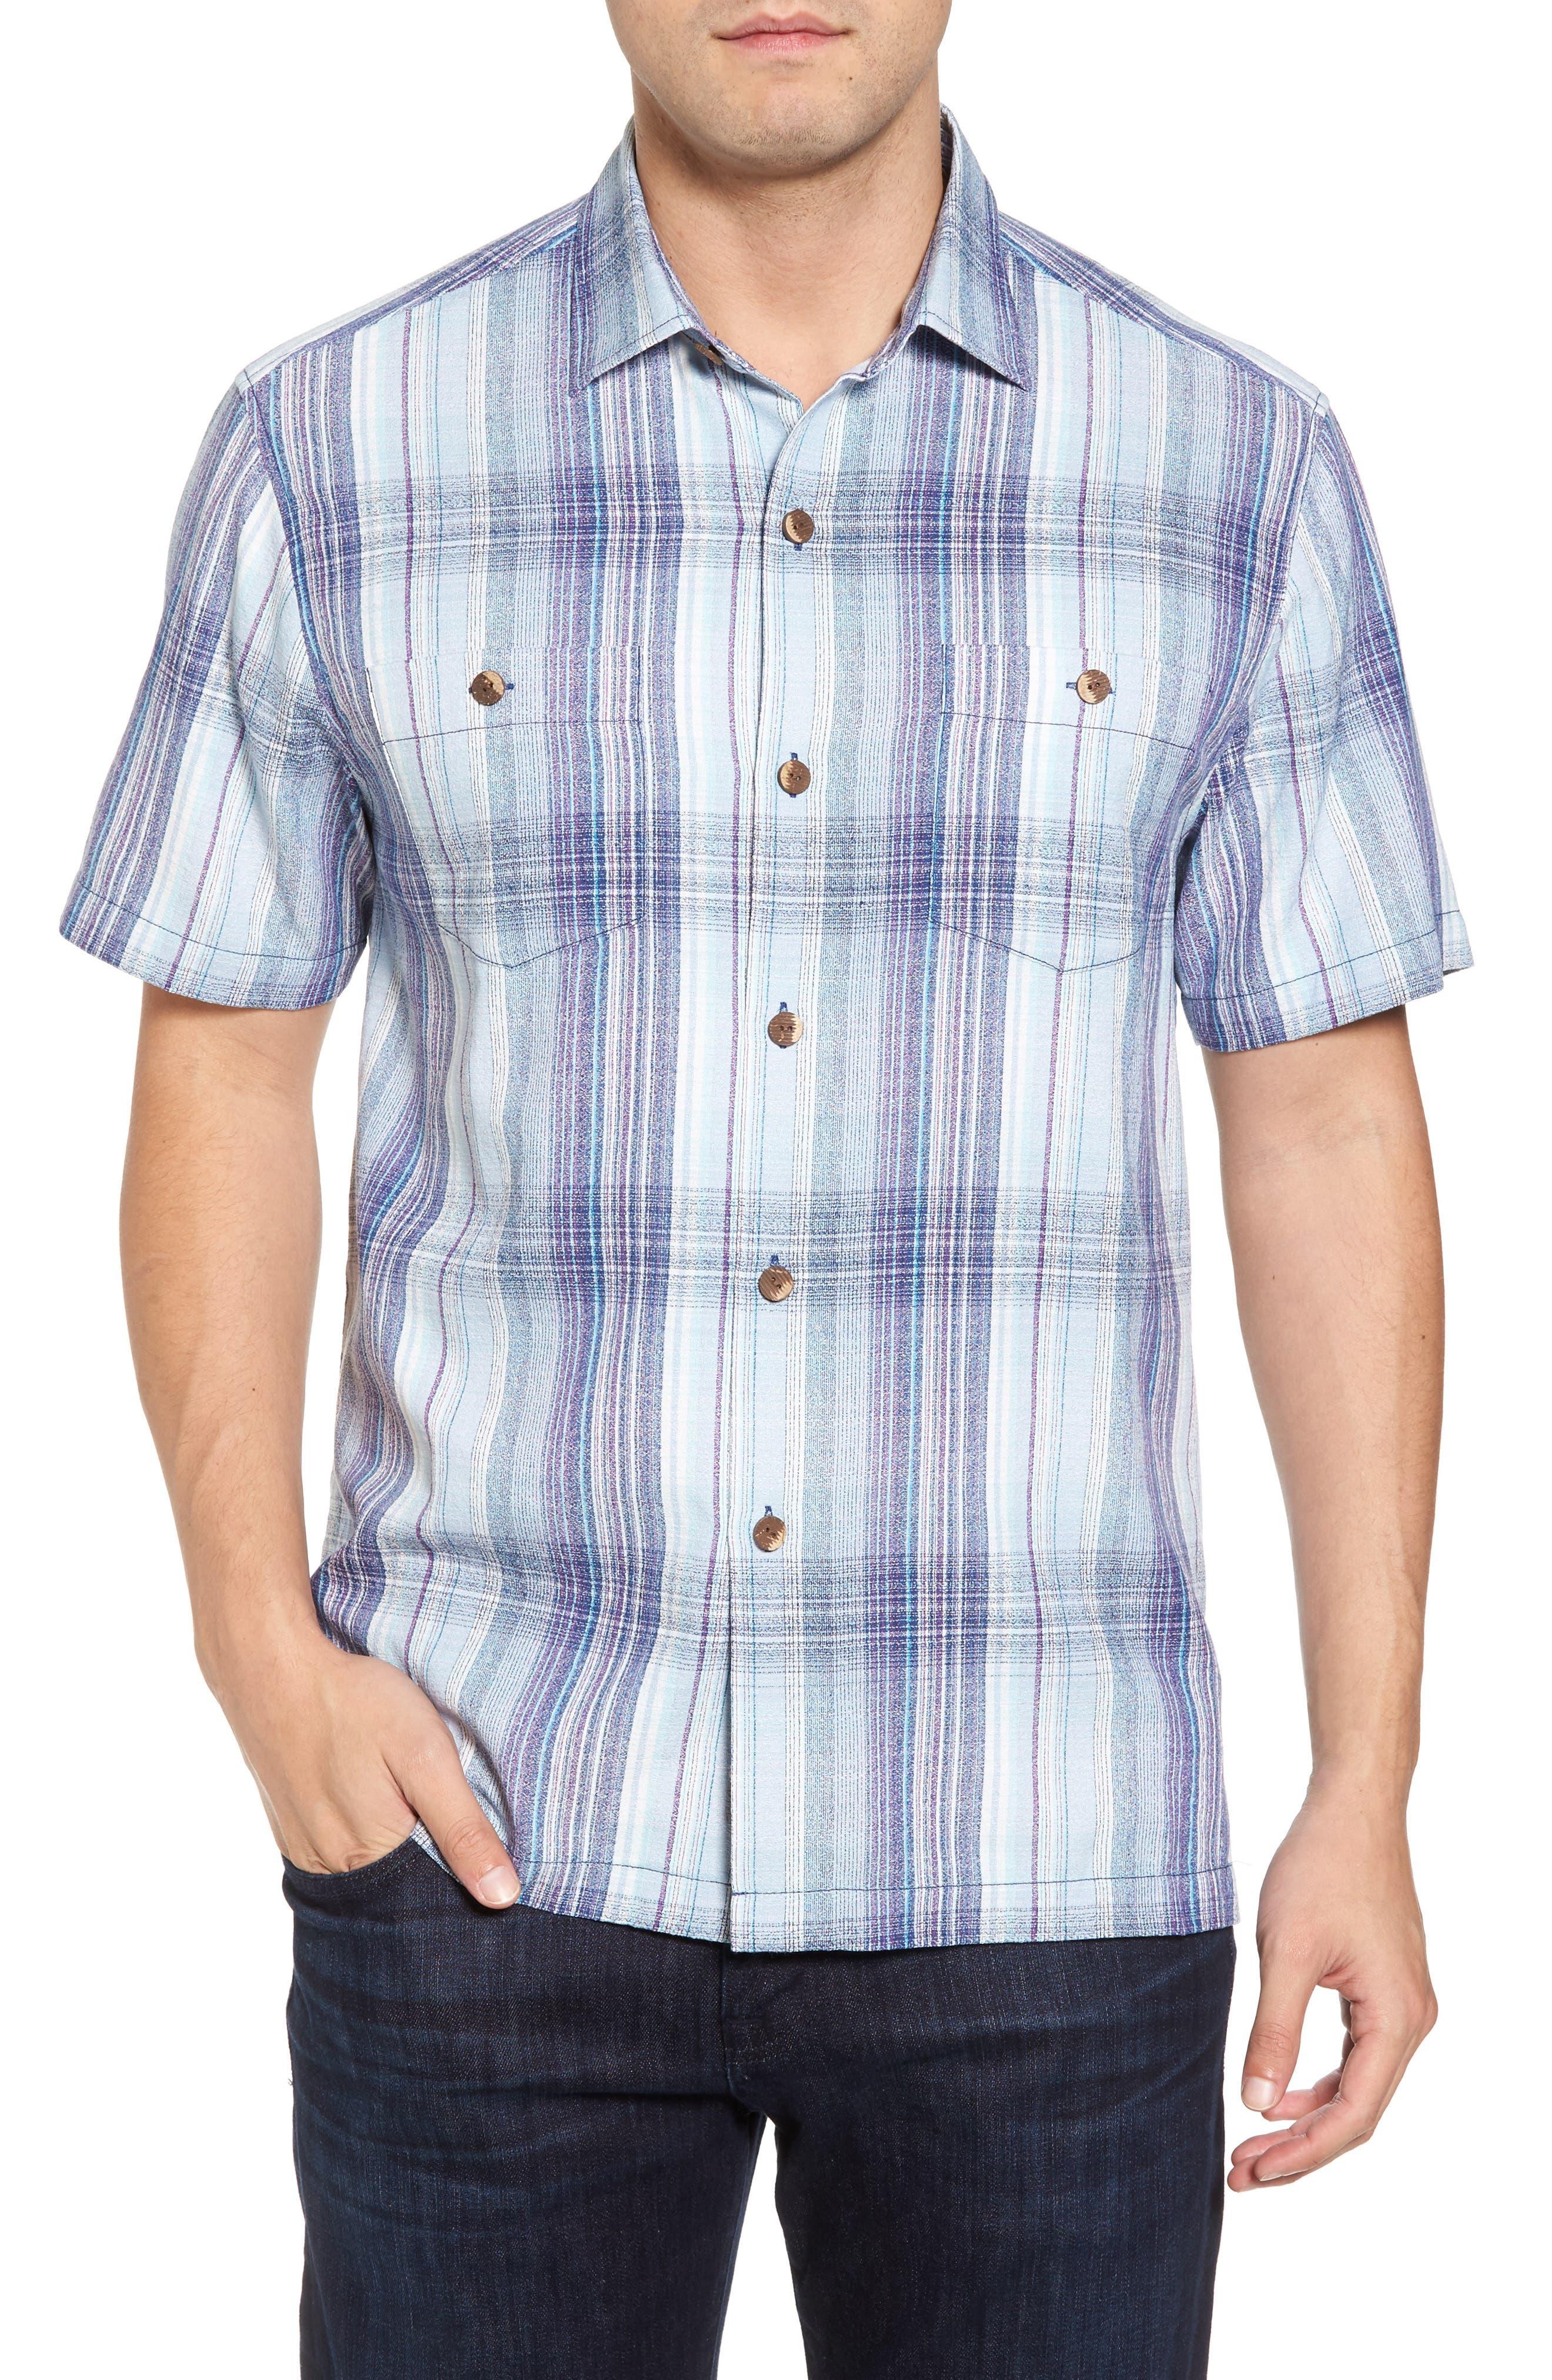 Main Image - Tommy Bahama Banyan Cay Regular Fit Silk Blend Sport Shirt